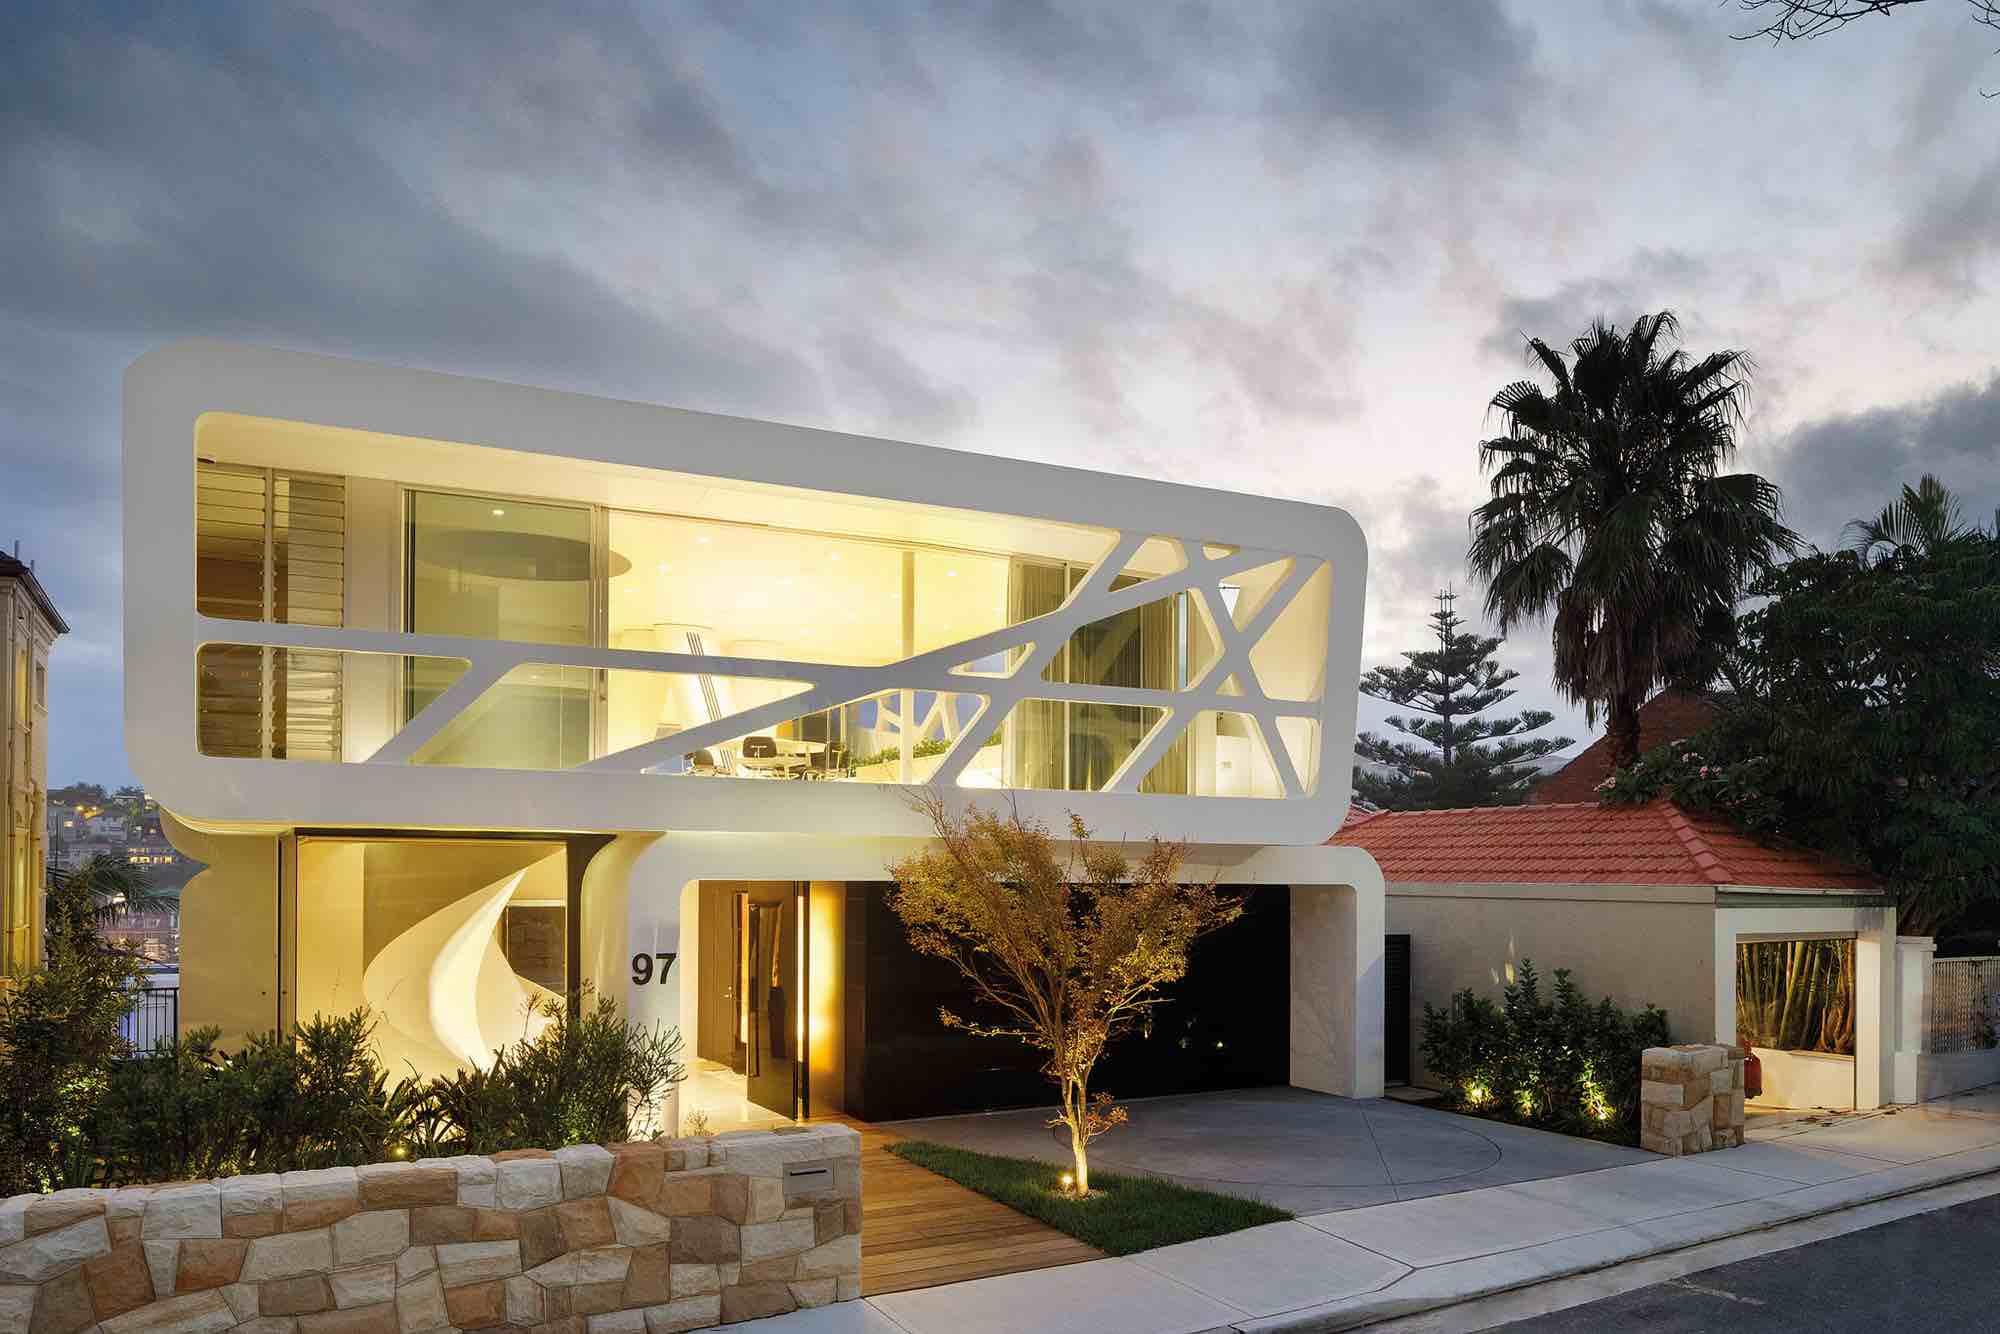 hewlett-street-house-mpr-design-group_hewlett_house19